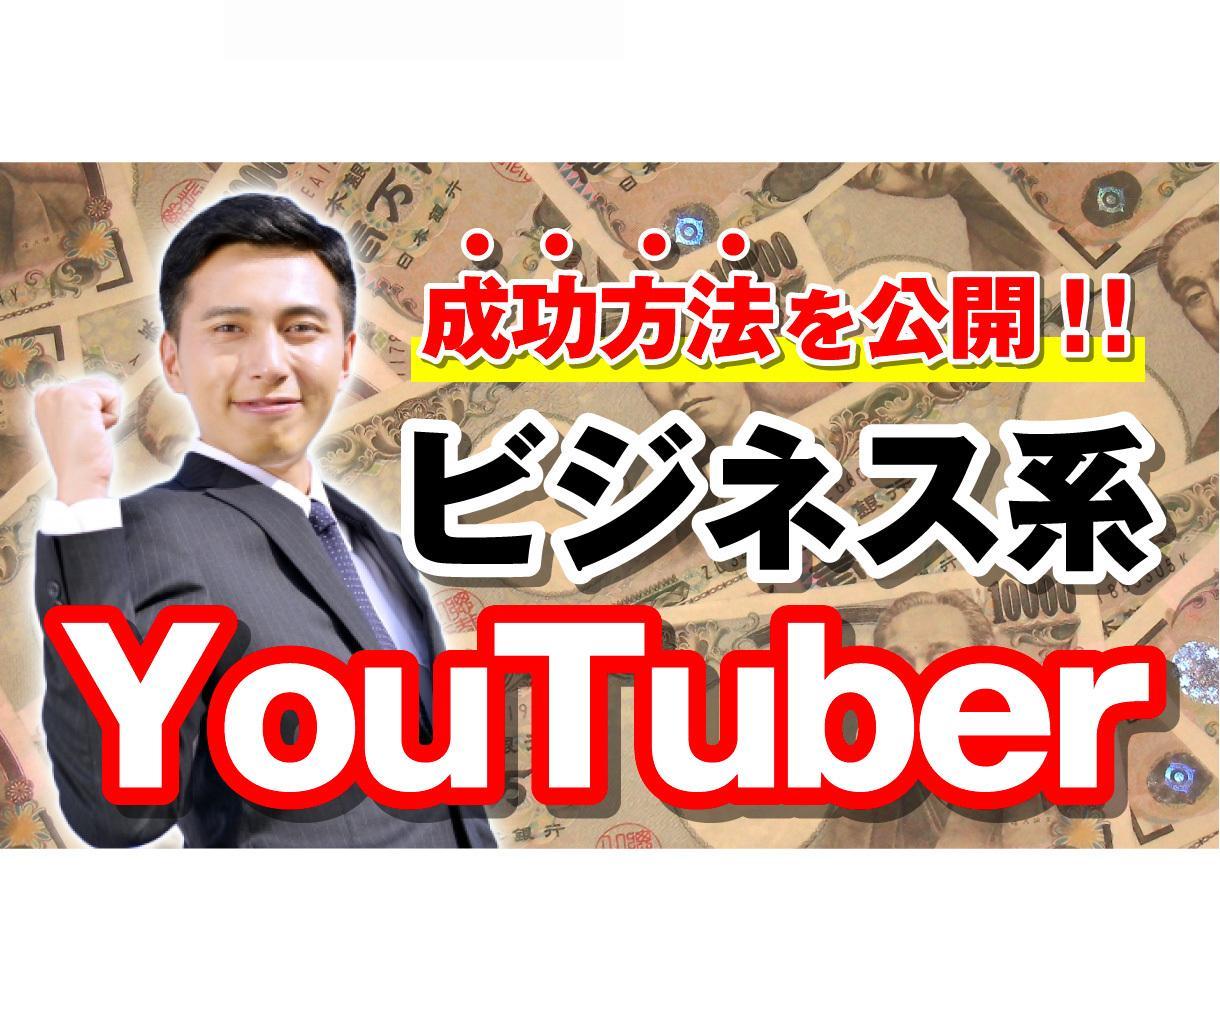 YouTubeサムネイル職人始めます 目立つYouTubeサムネイル画像作ります!